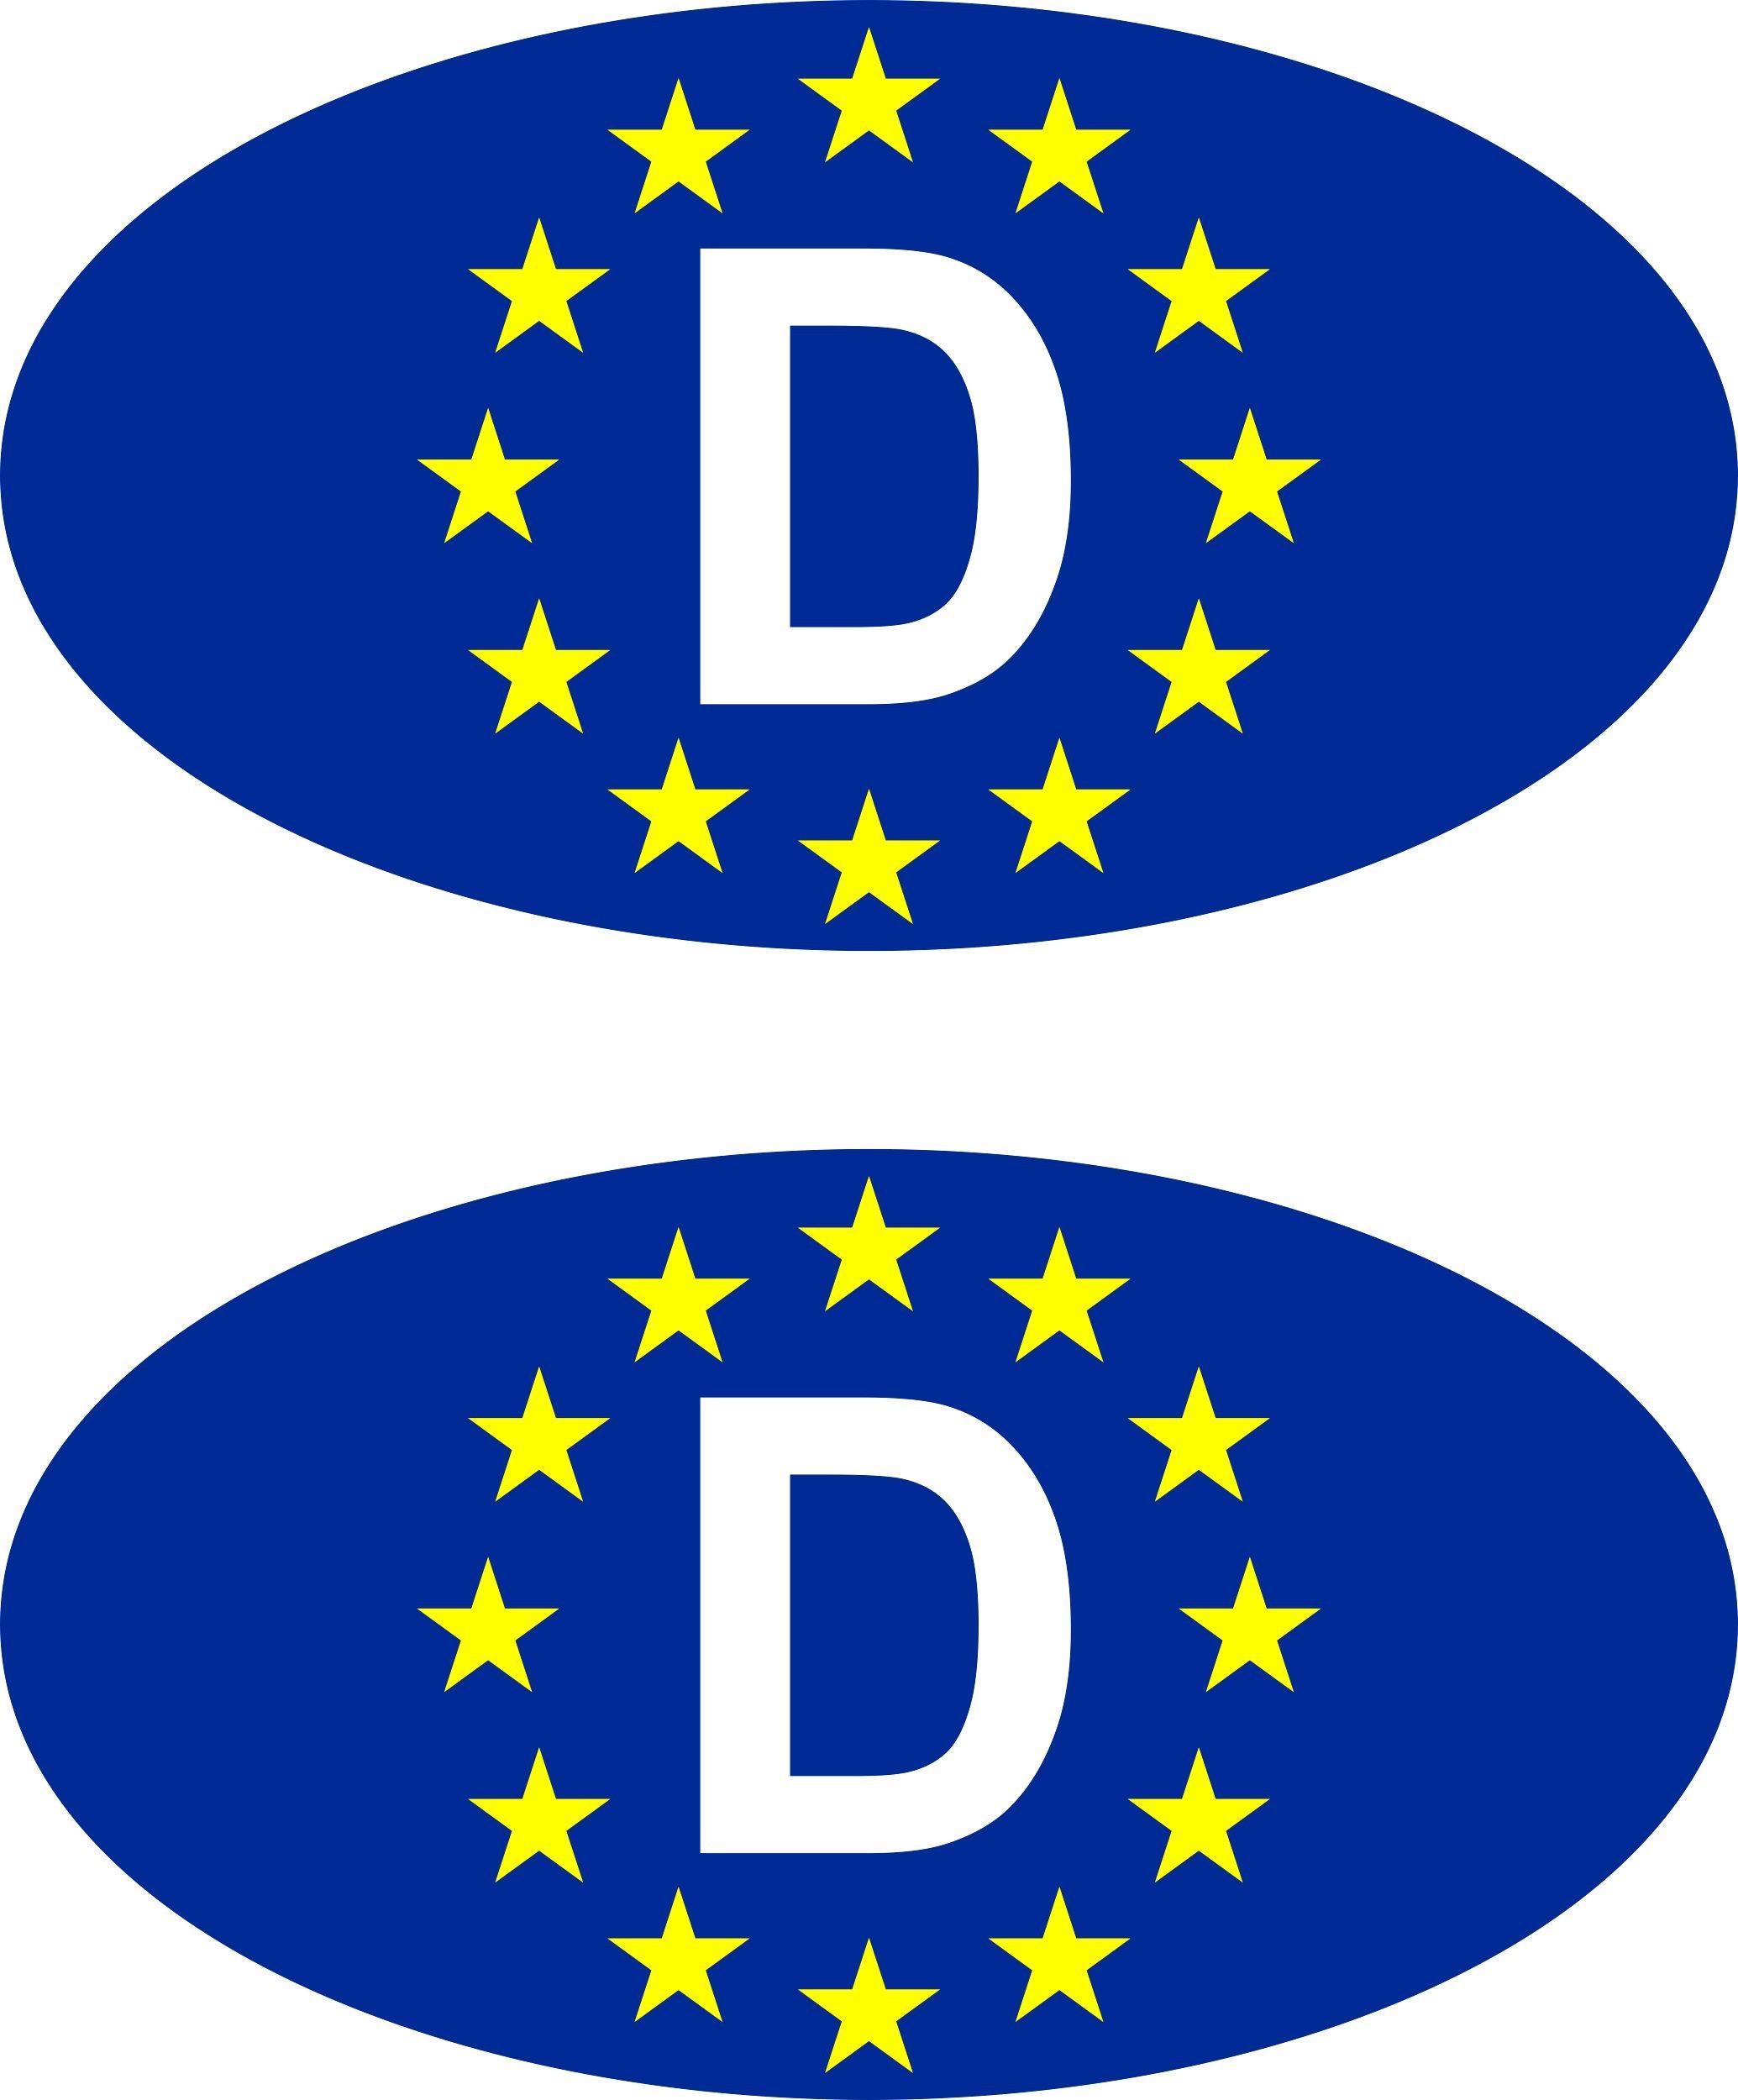 Aufkleber Europa-D Holografie 2er-Set je 55 x 30 mm Deutschland Fanartikel Olympia – Bild 1